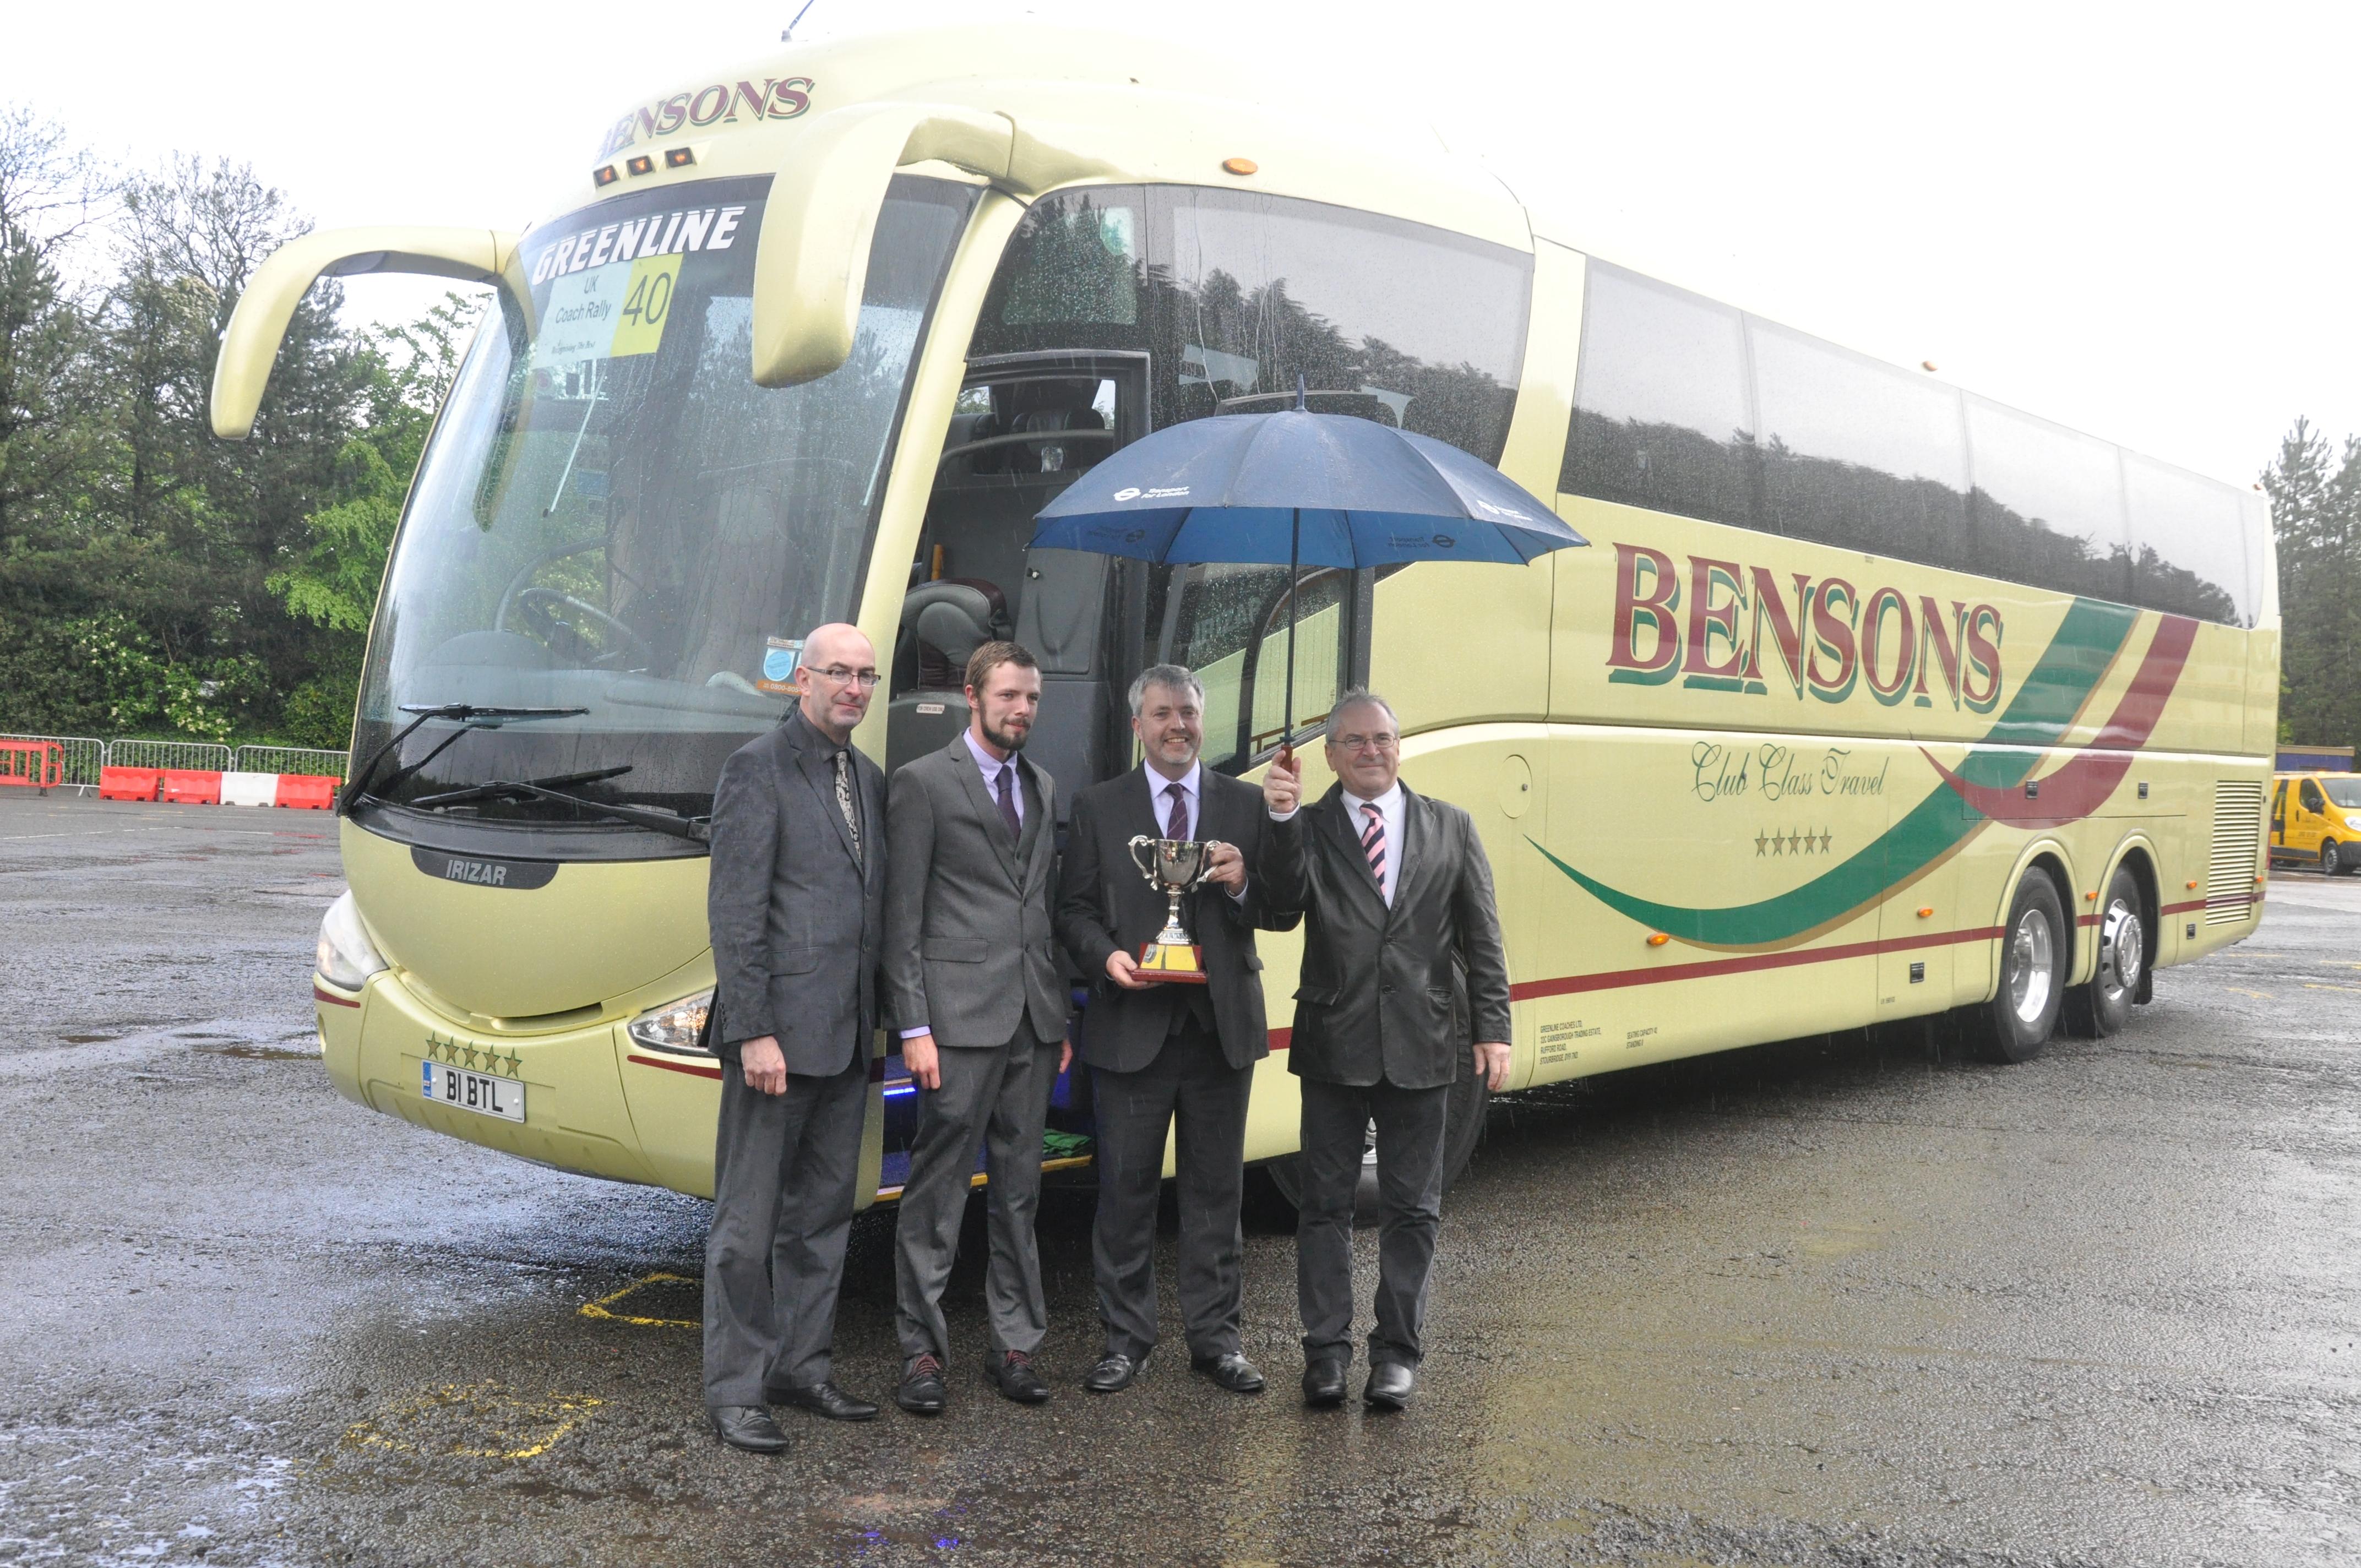 Bensons Travel Ltd